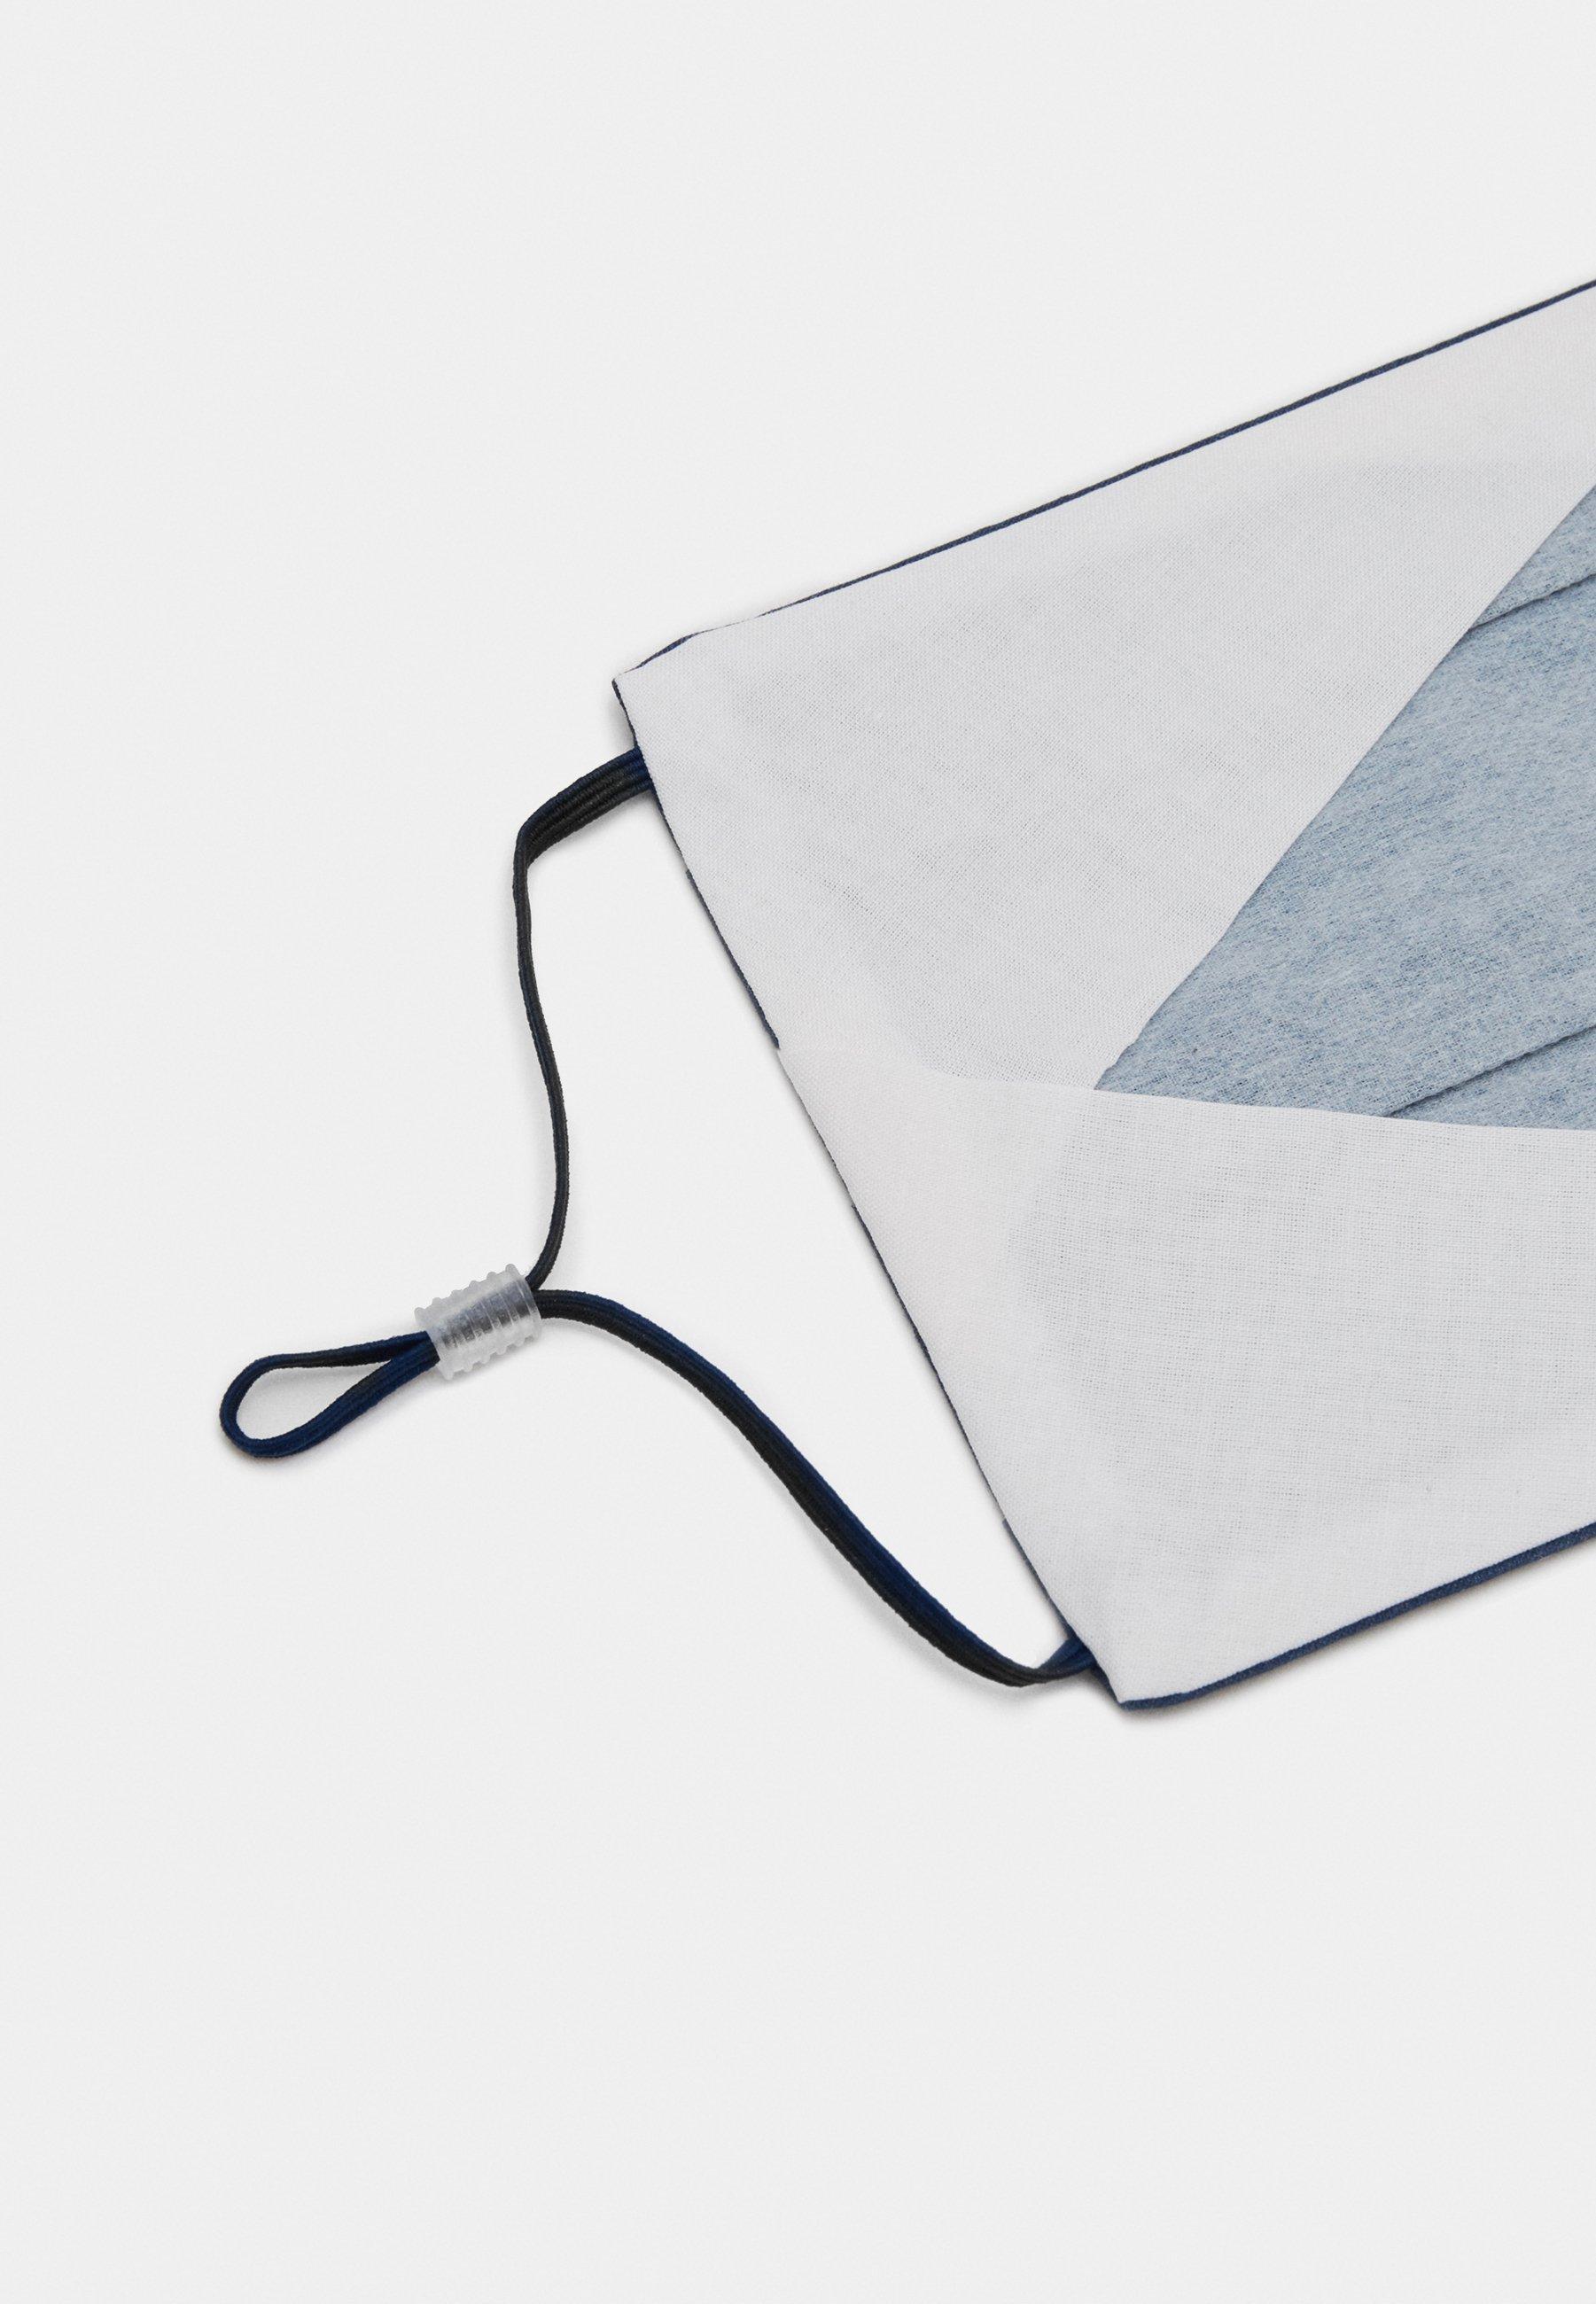 Codello COVER UP SOLID - Munnbind i tøy - navy blue/mørkeblå GBjsSh0XGdOpUiw